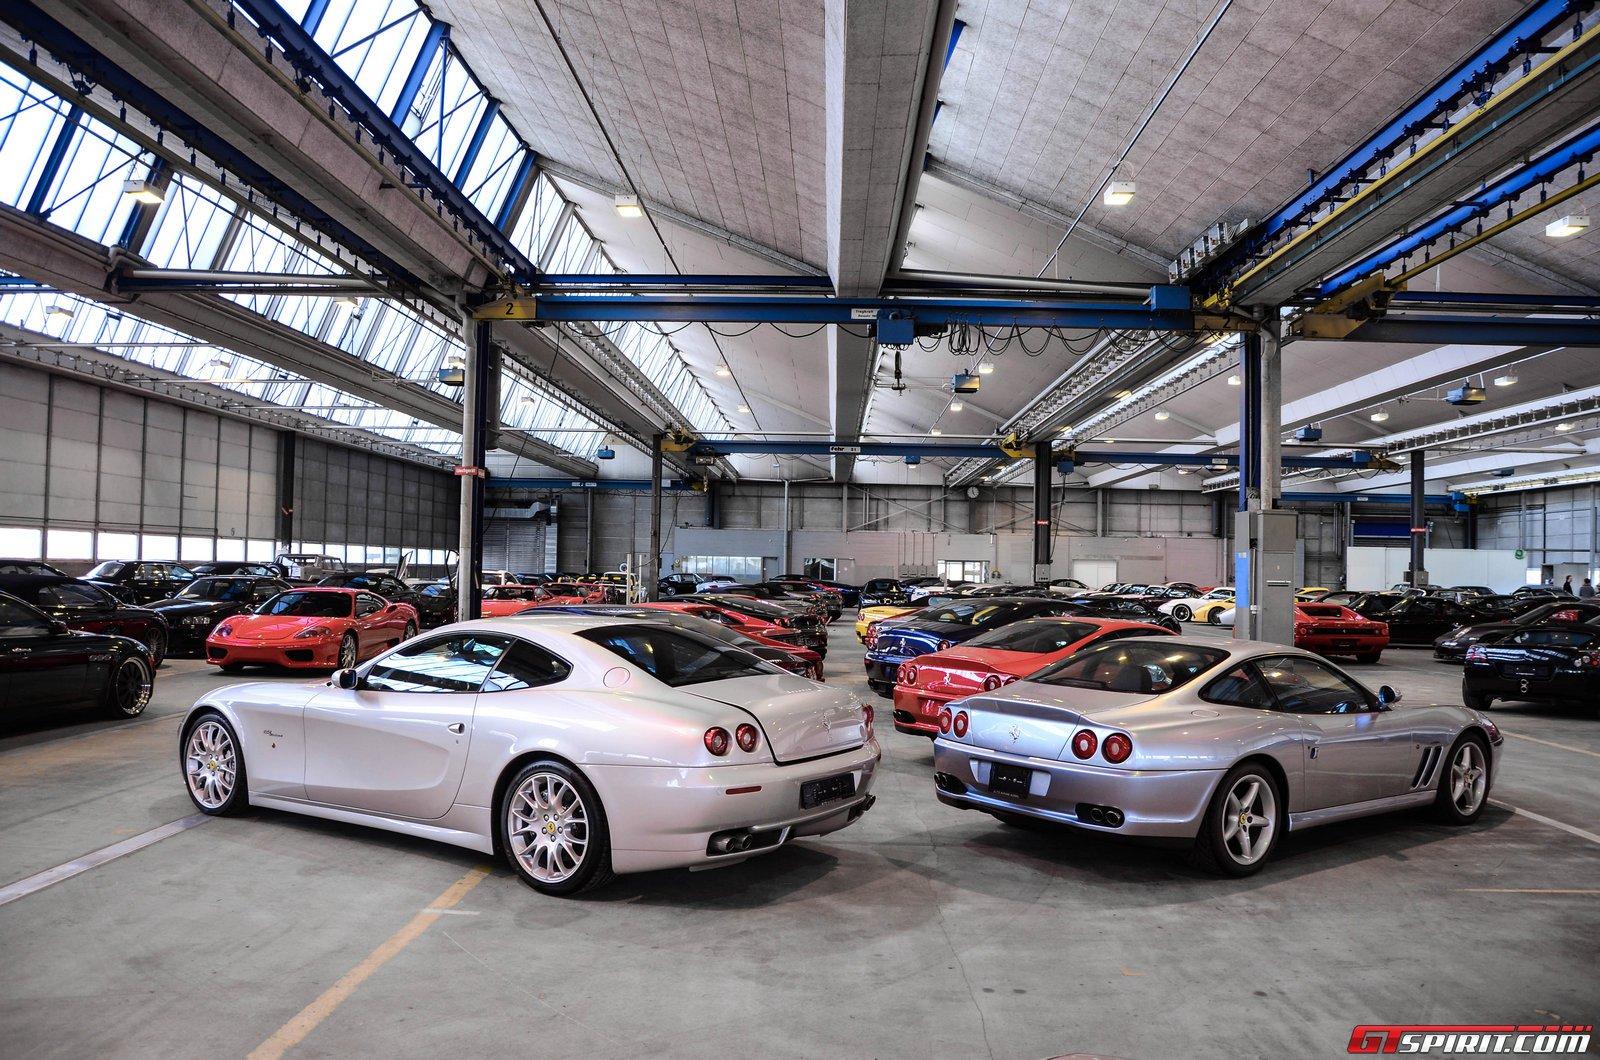 Gtspirit visits elite garage part 2 gtspirit for Garage automobile paris 16